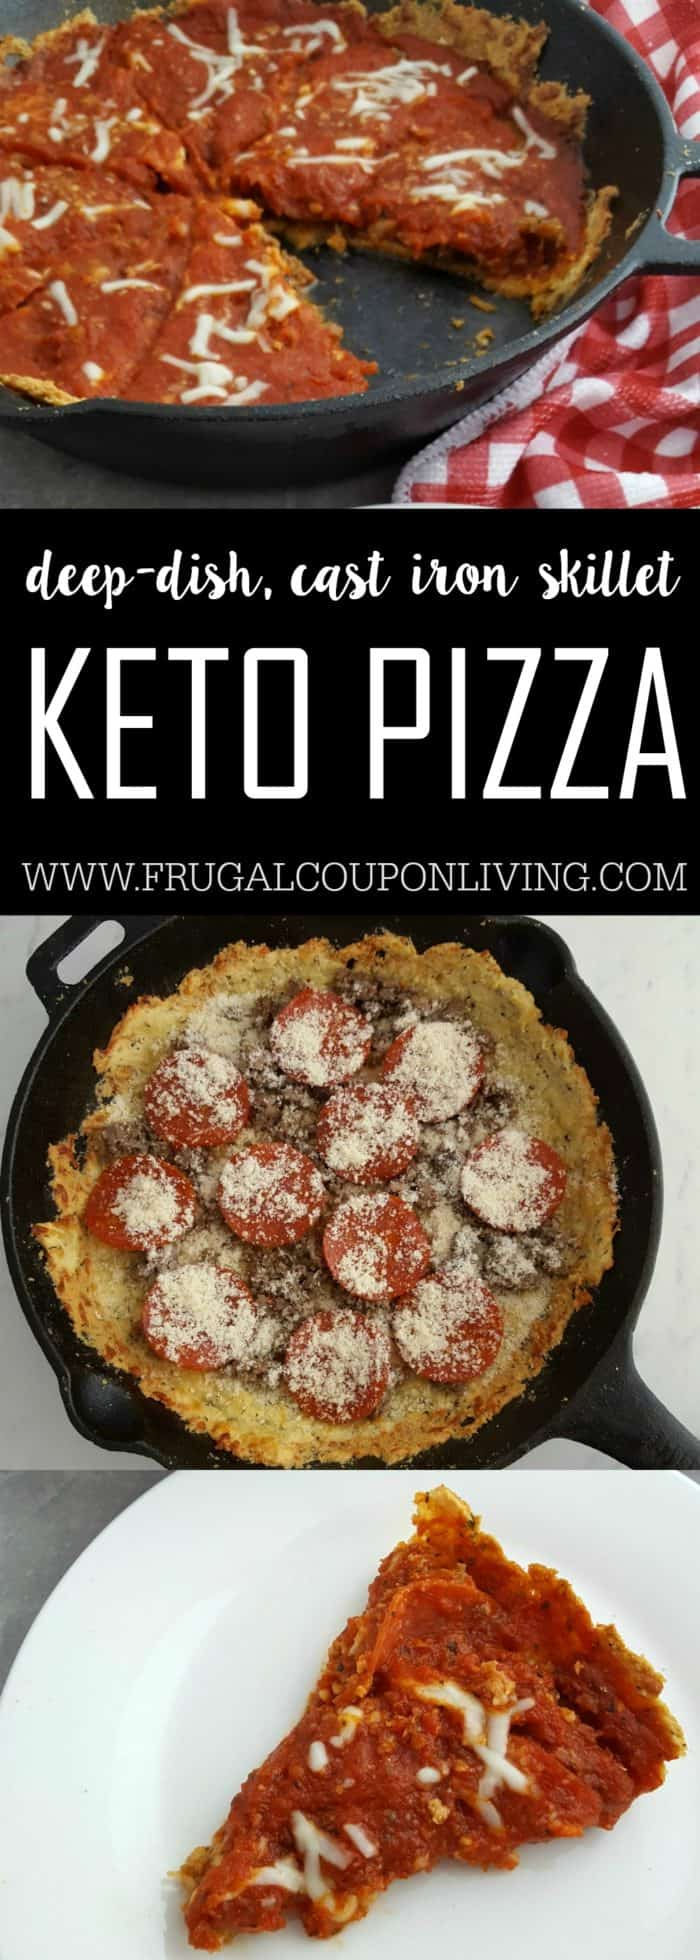 Keto Pizza - Deep Dish Recipe in a Cast Iron Skillet